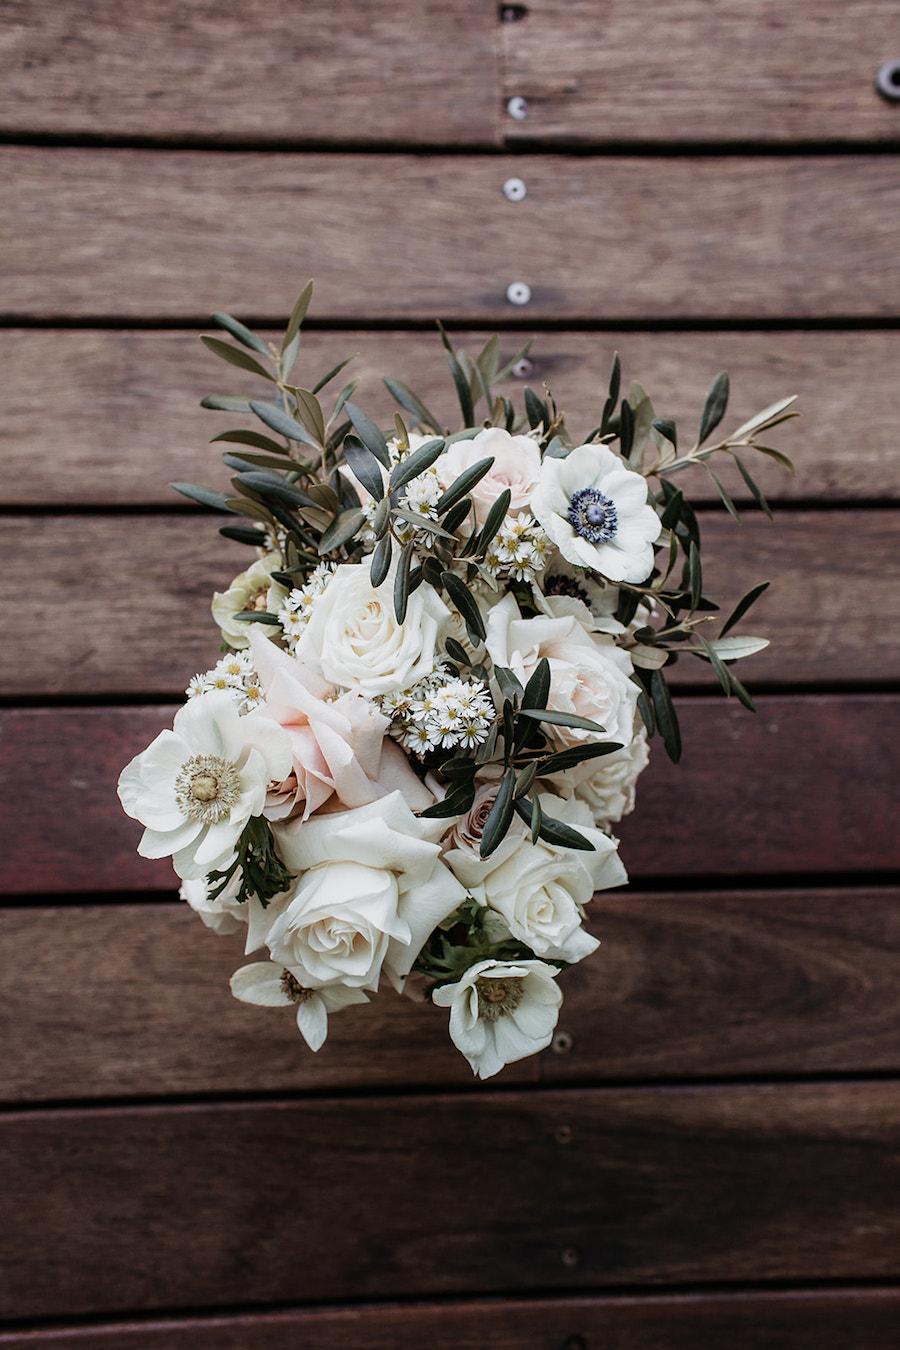 tweed-coast-weddings-wedding-venue-osteria-kelly-rohan-cloud-catcher-photography-Web_RK053.jpg